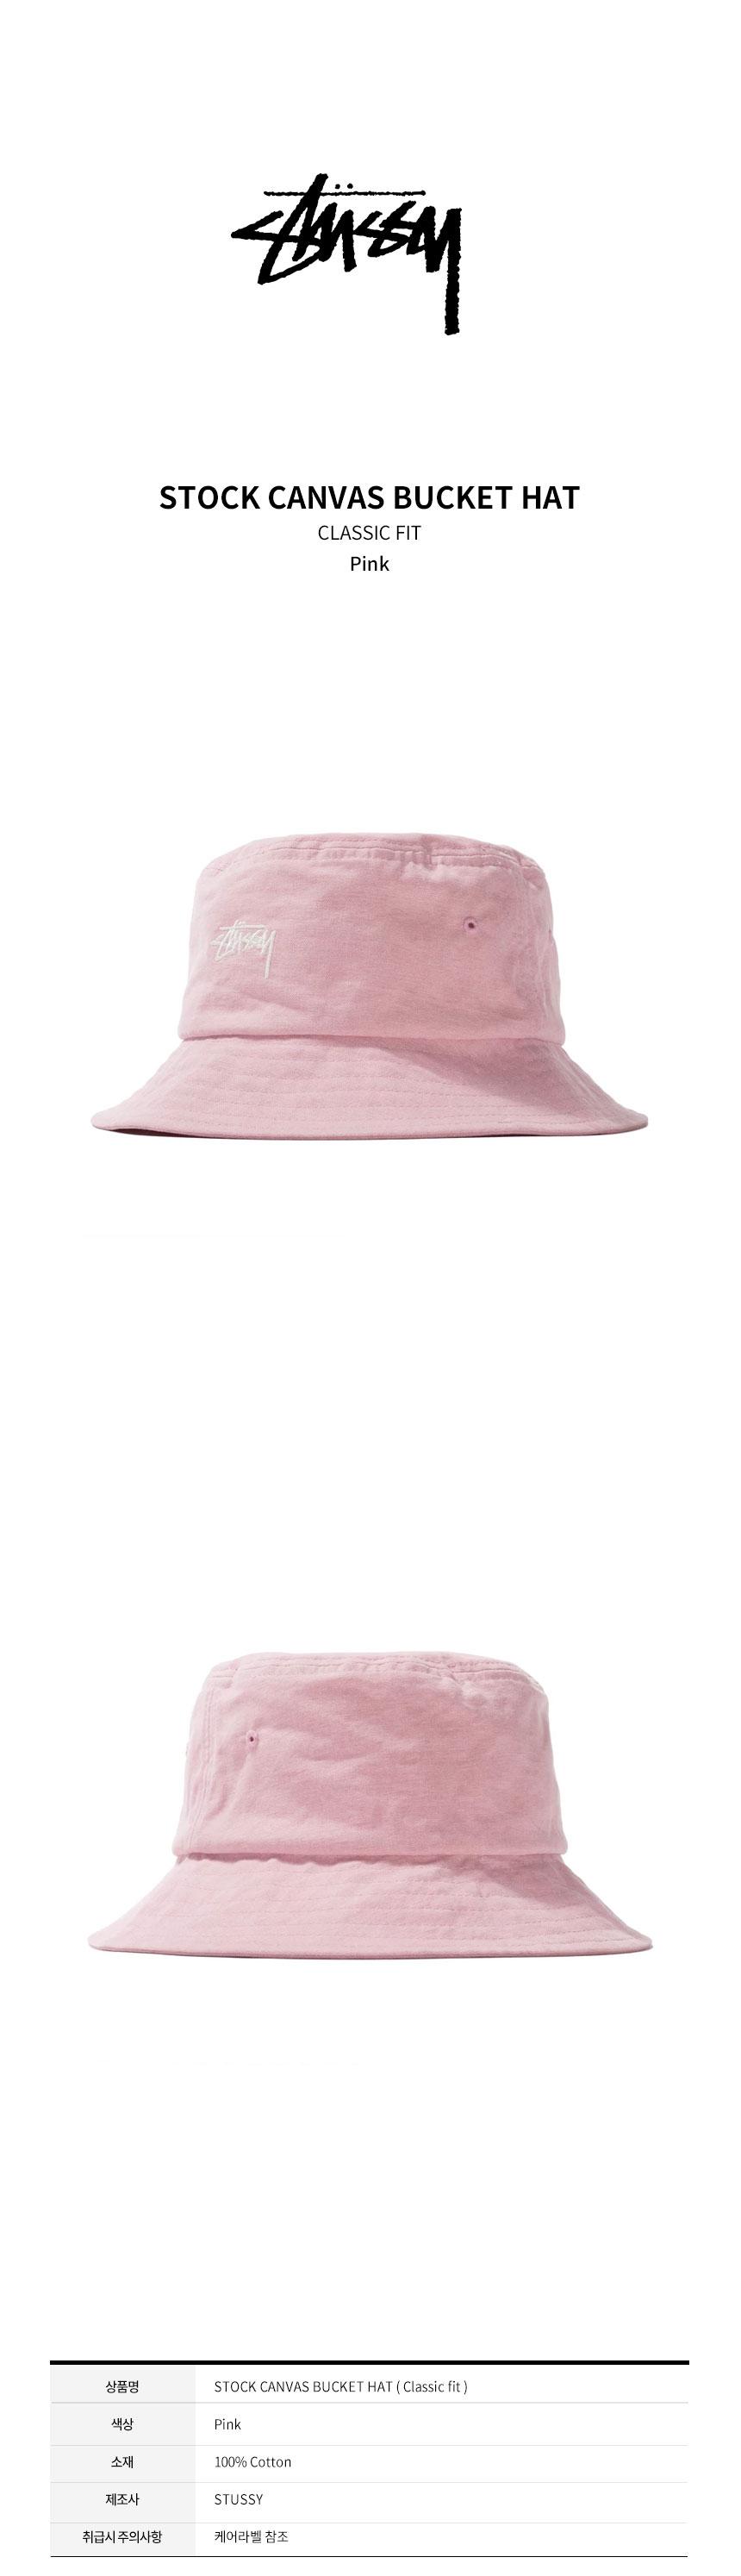 3097219_Pink.jpg